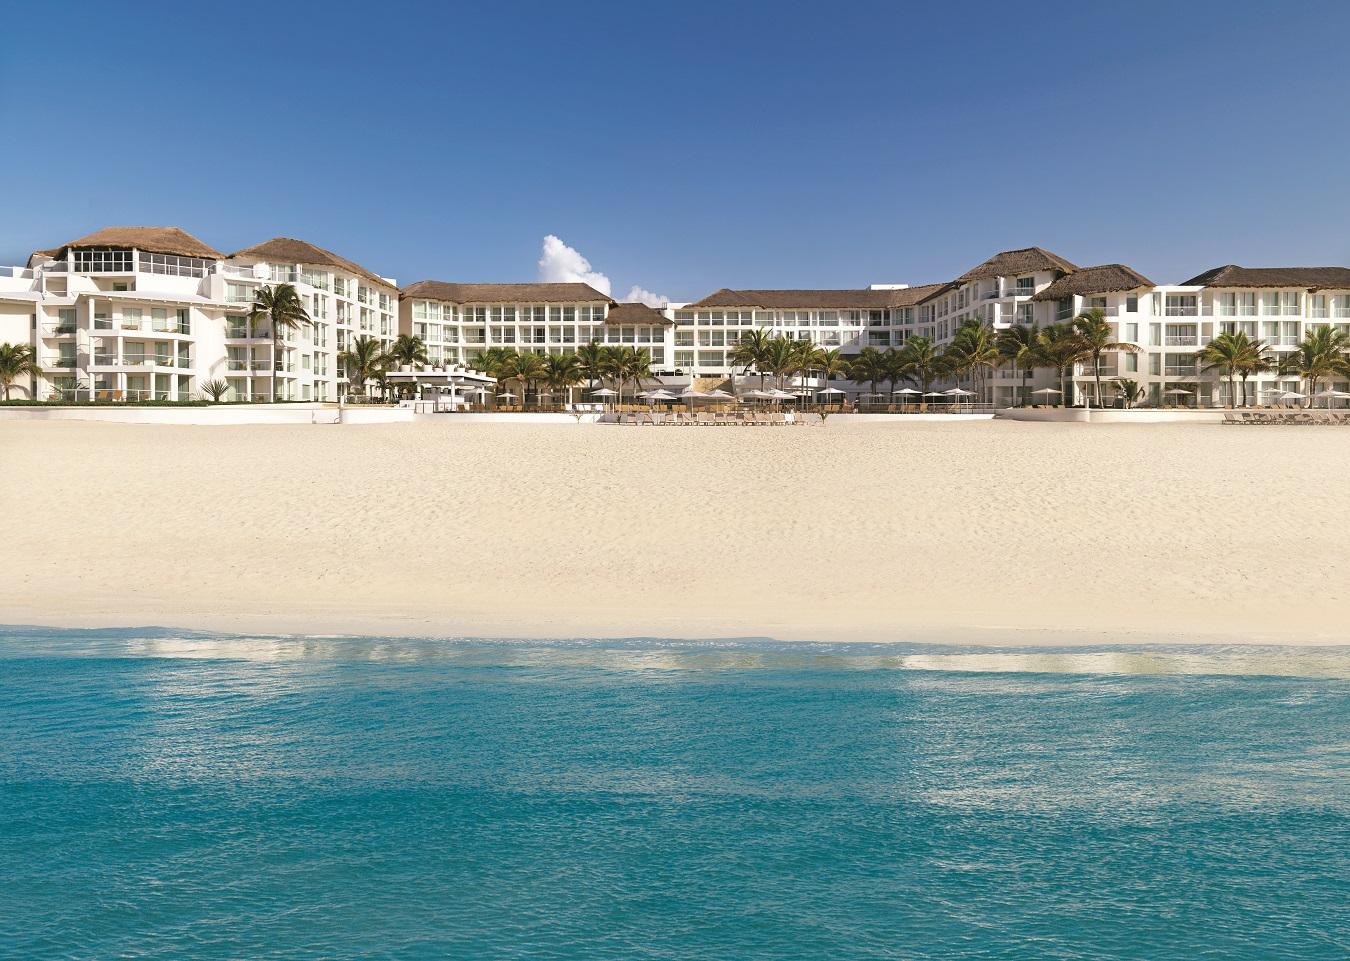 Playacar Palace hotel view